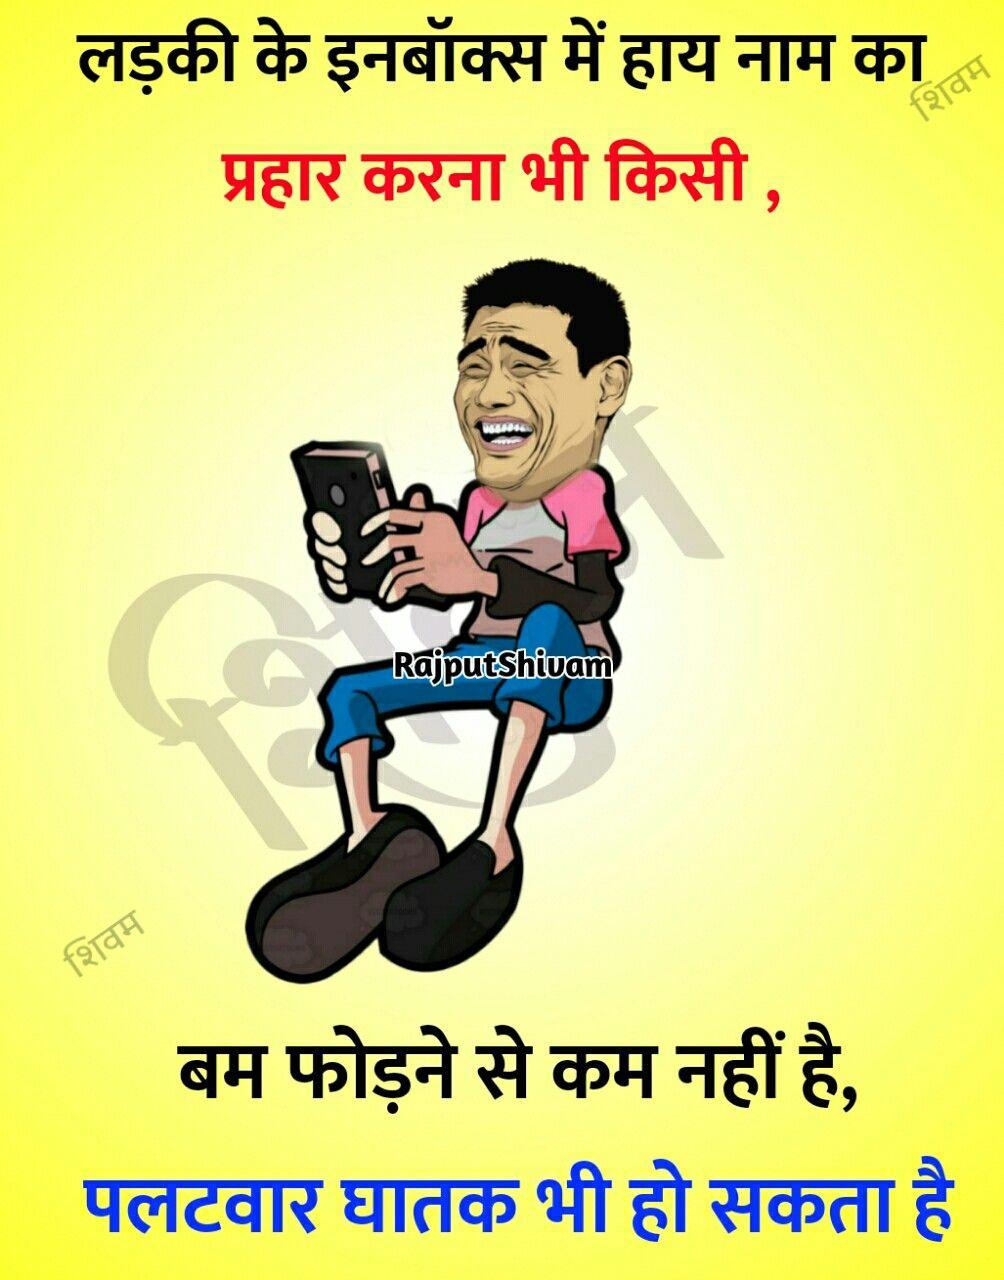 Pin by Shivam on jokes Jokes in hindi, Jokes, Comedy